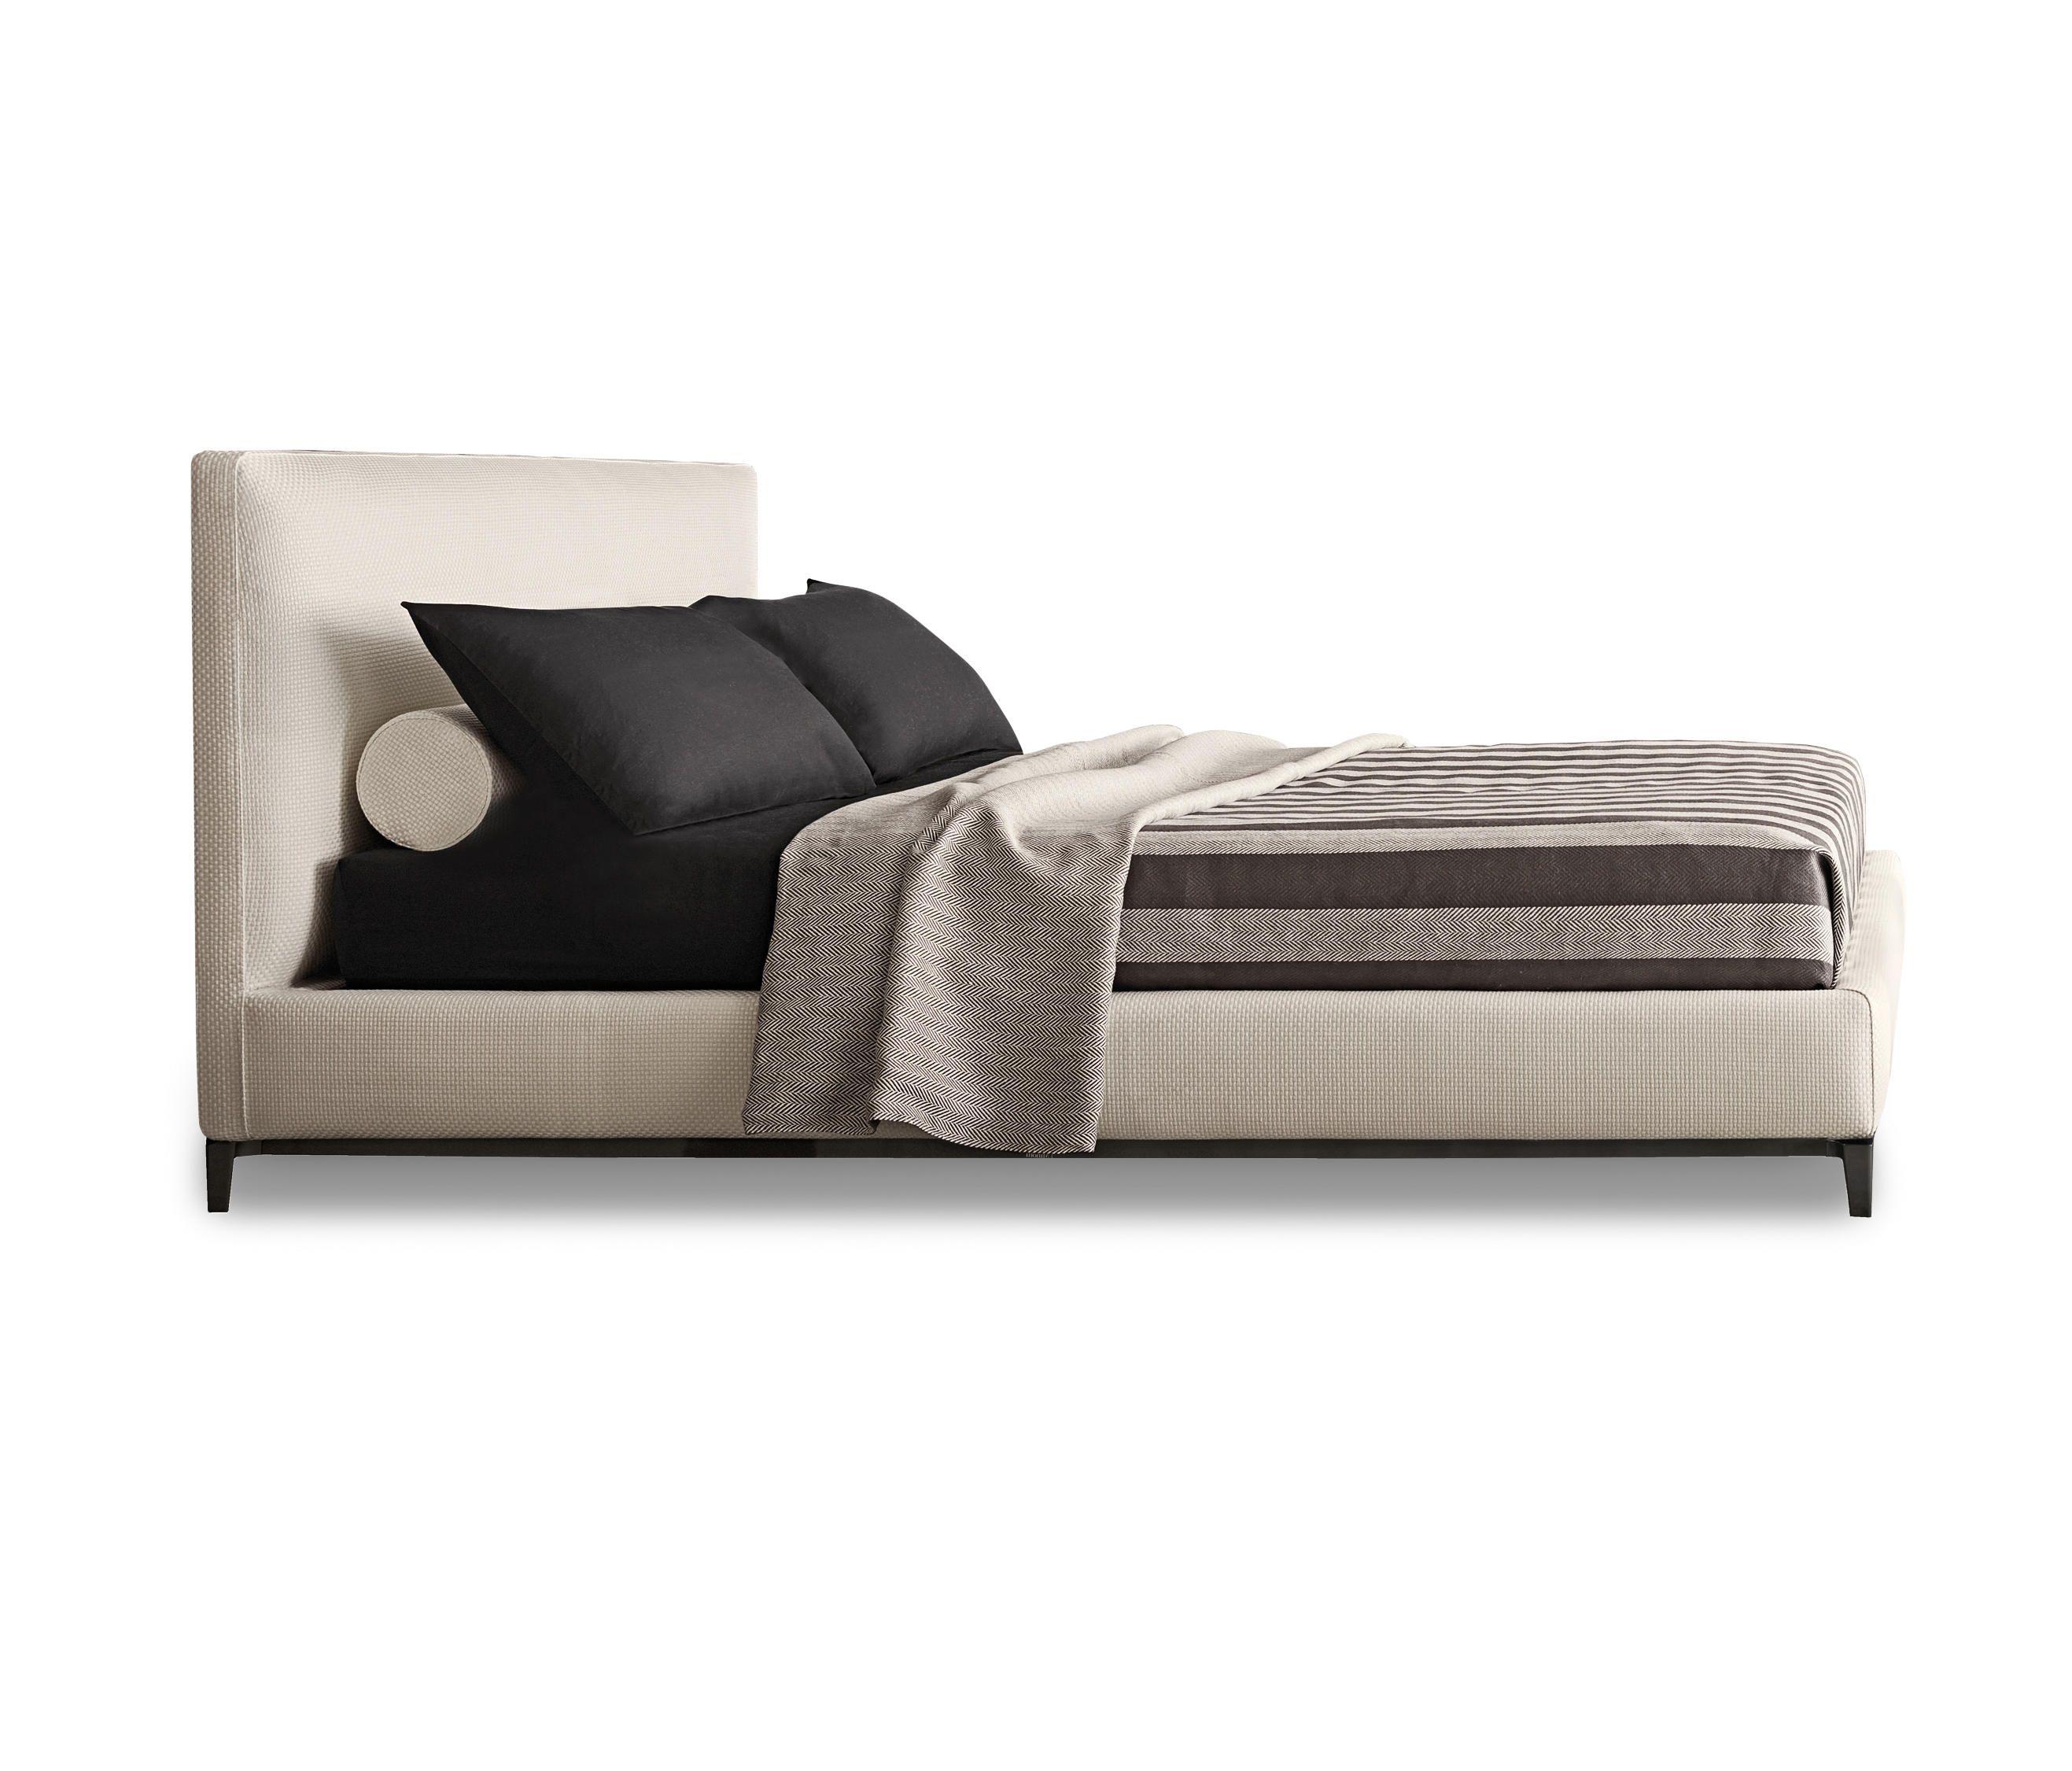 Andersen Bed Designer Beds From Minotti All Information